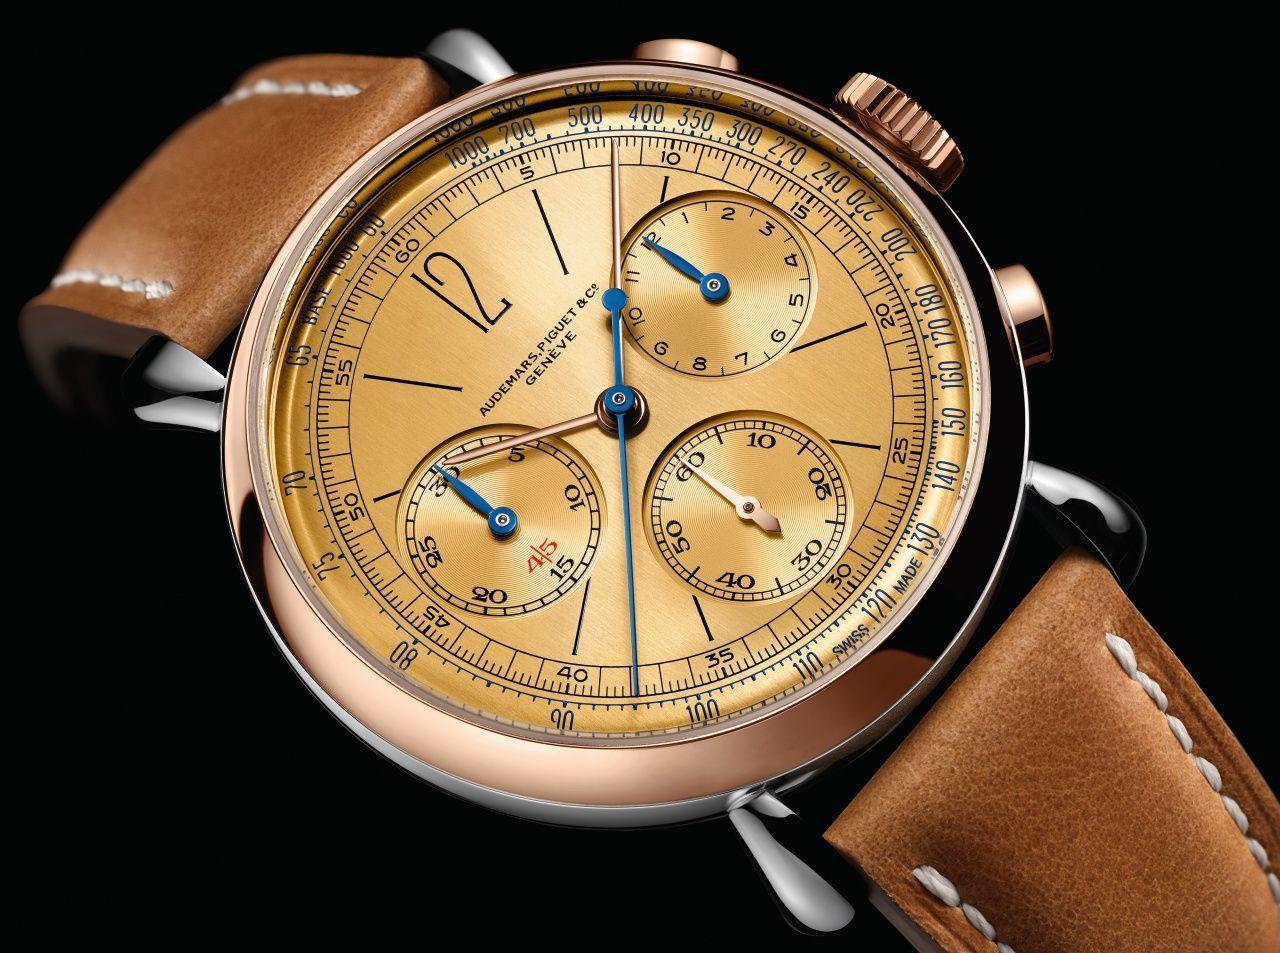 [Re]master01復刻版計時碼錶,承襲1943年原創計時碼錶的美學by Audemars Piguet。